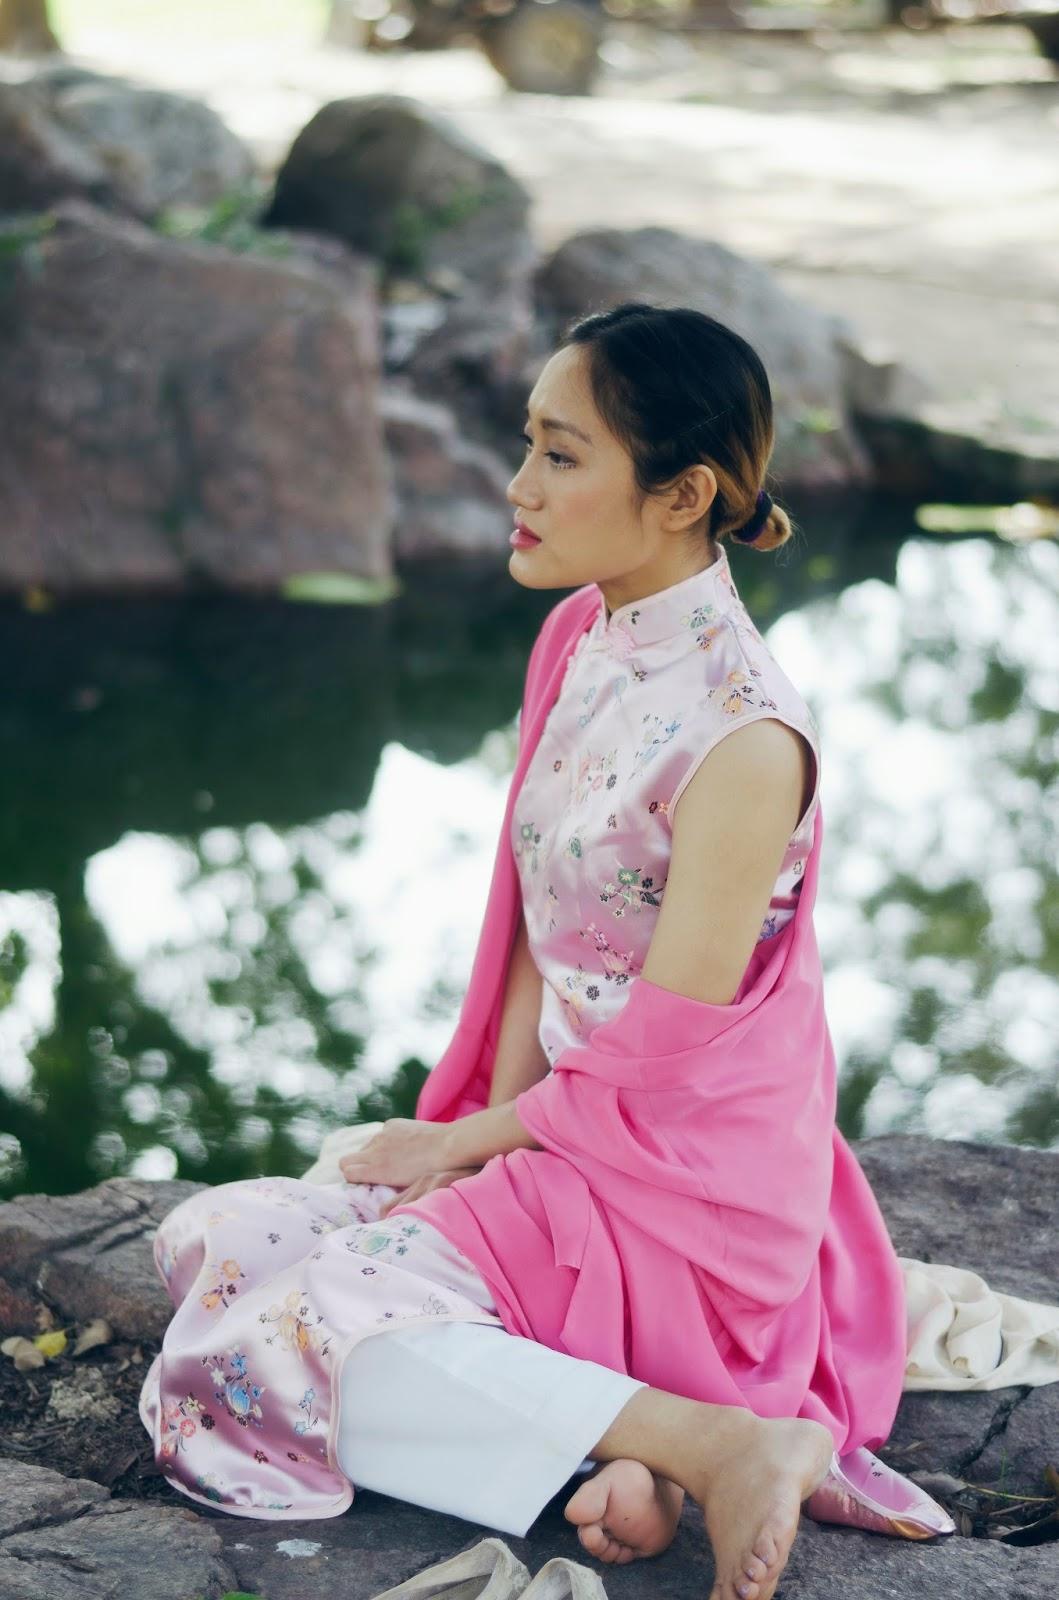 March, Spring, SS15, Flowers, Chinese Dress, Qipao Cheongsam, Silk 0